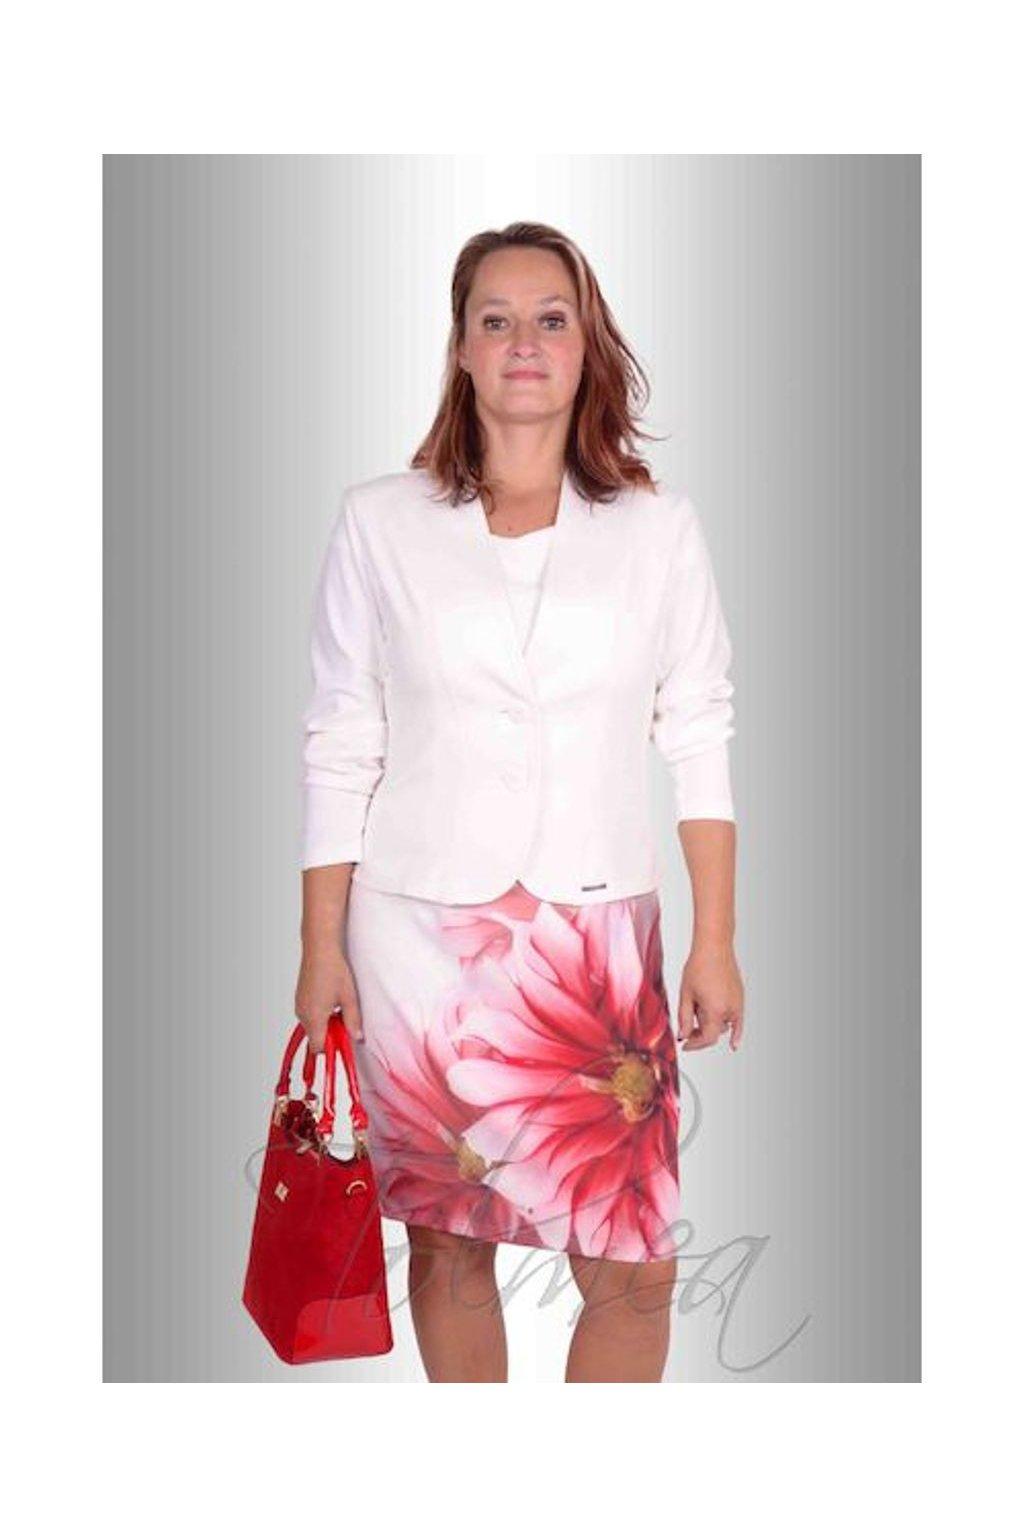 Kabátek k šatům 2117 (Velikost 36, Barva Bílá)